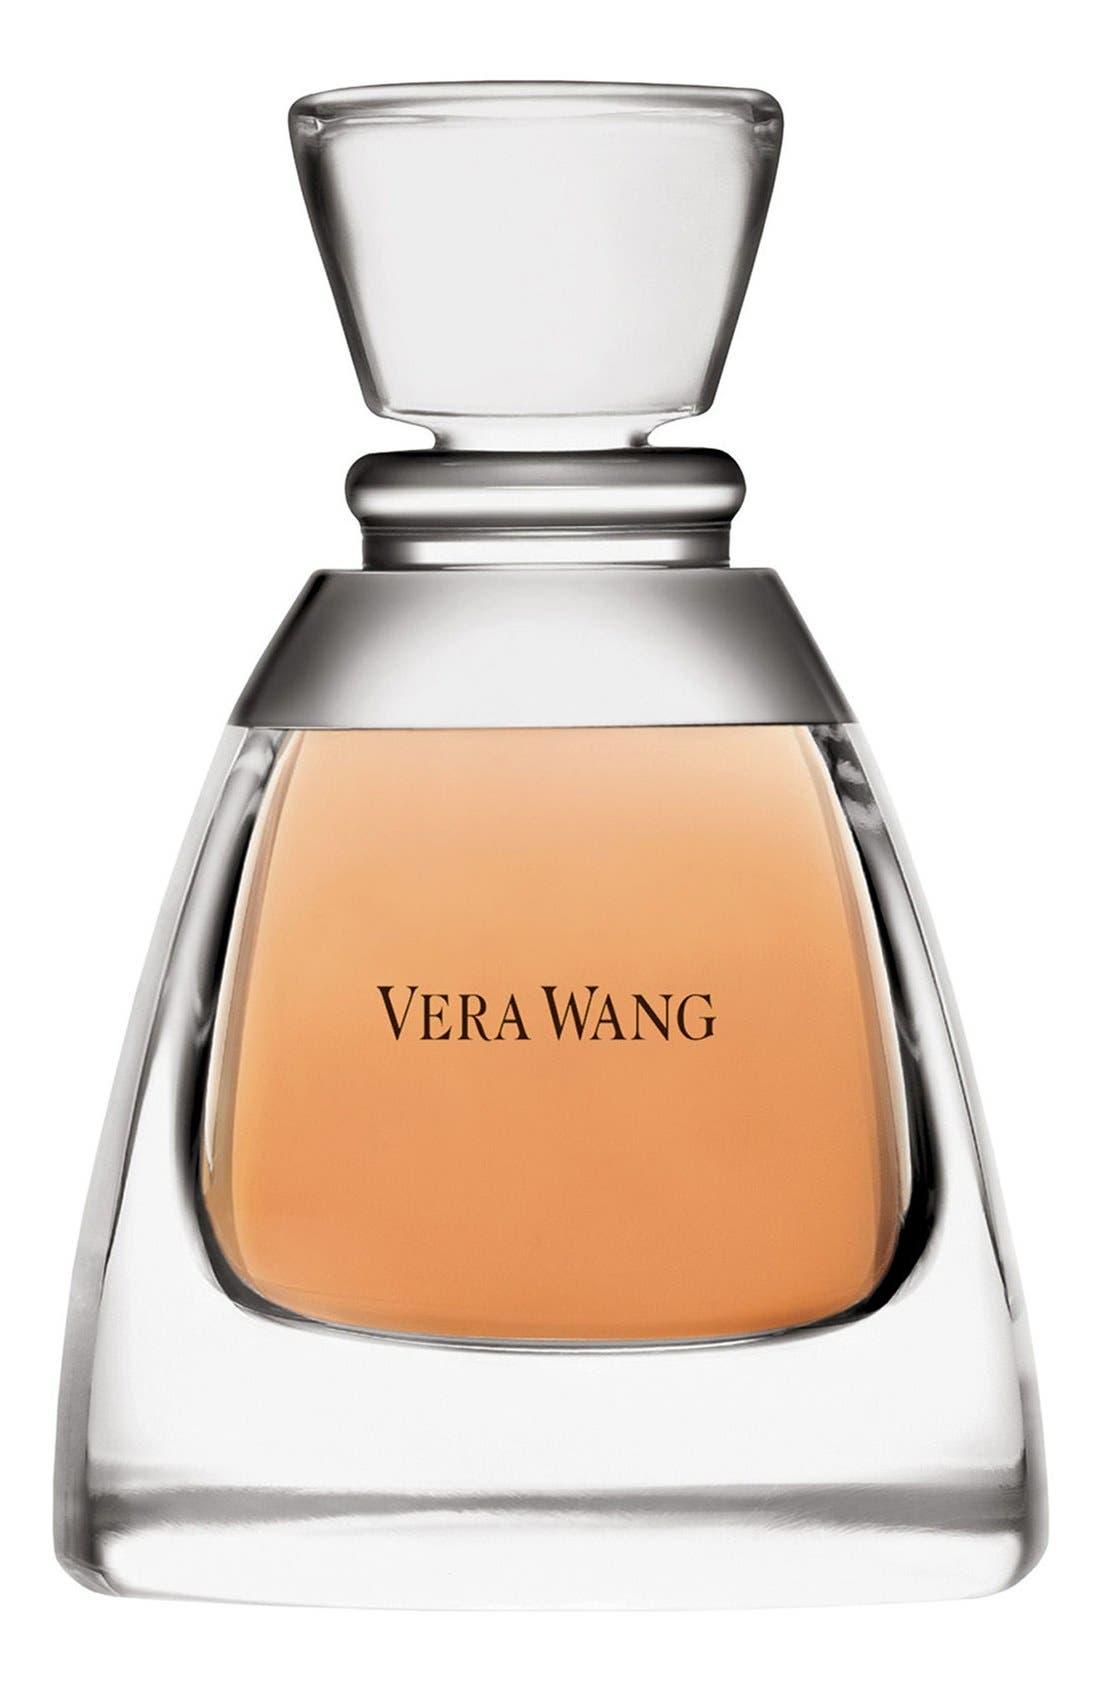 VERA WANG Eau de Parfum Spray, Main, color, 000